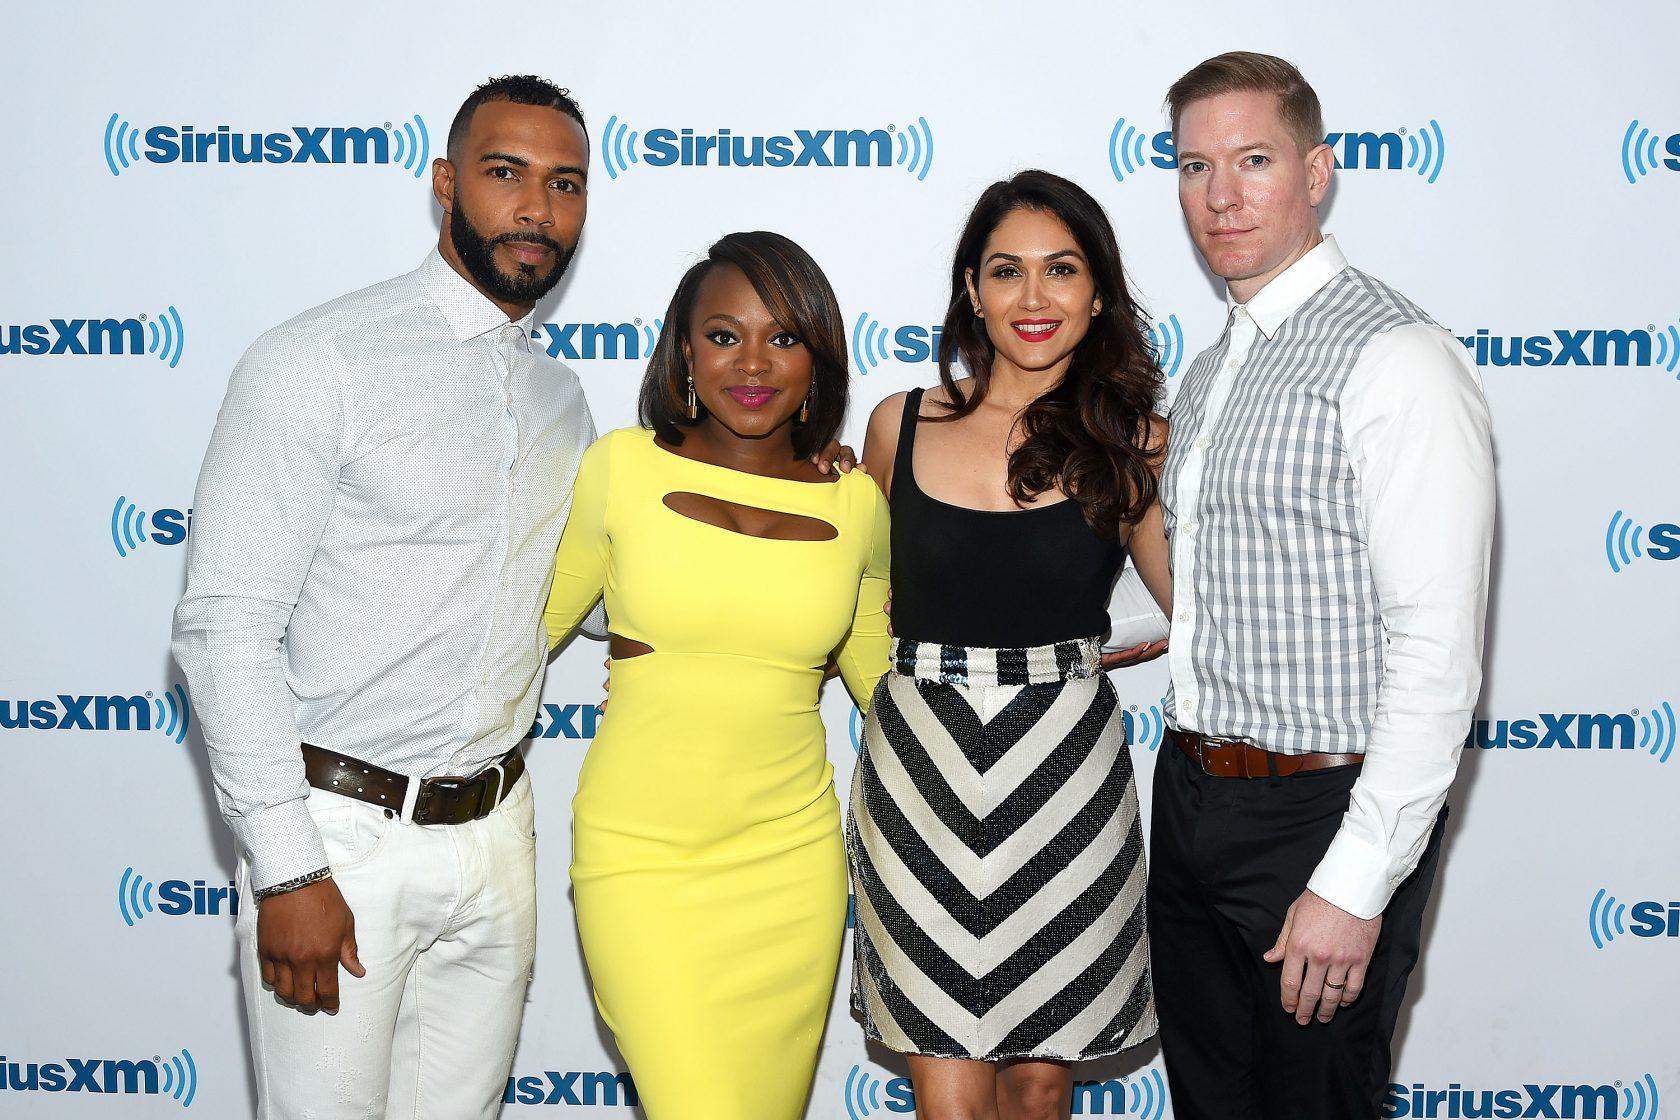 Celebrities Visit SiriusXM - July 14, 2016